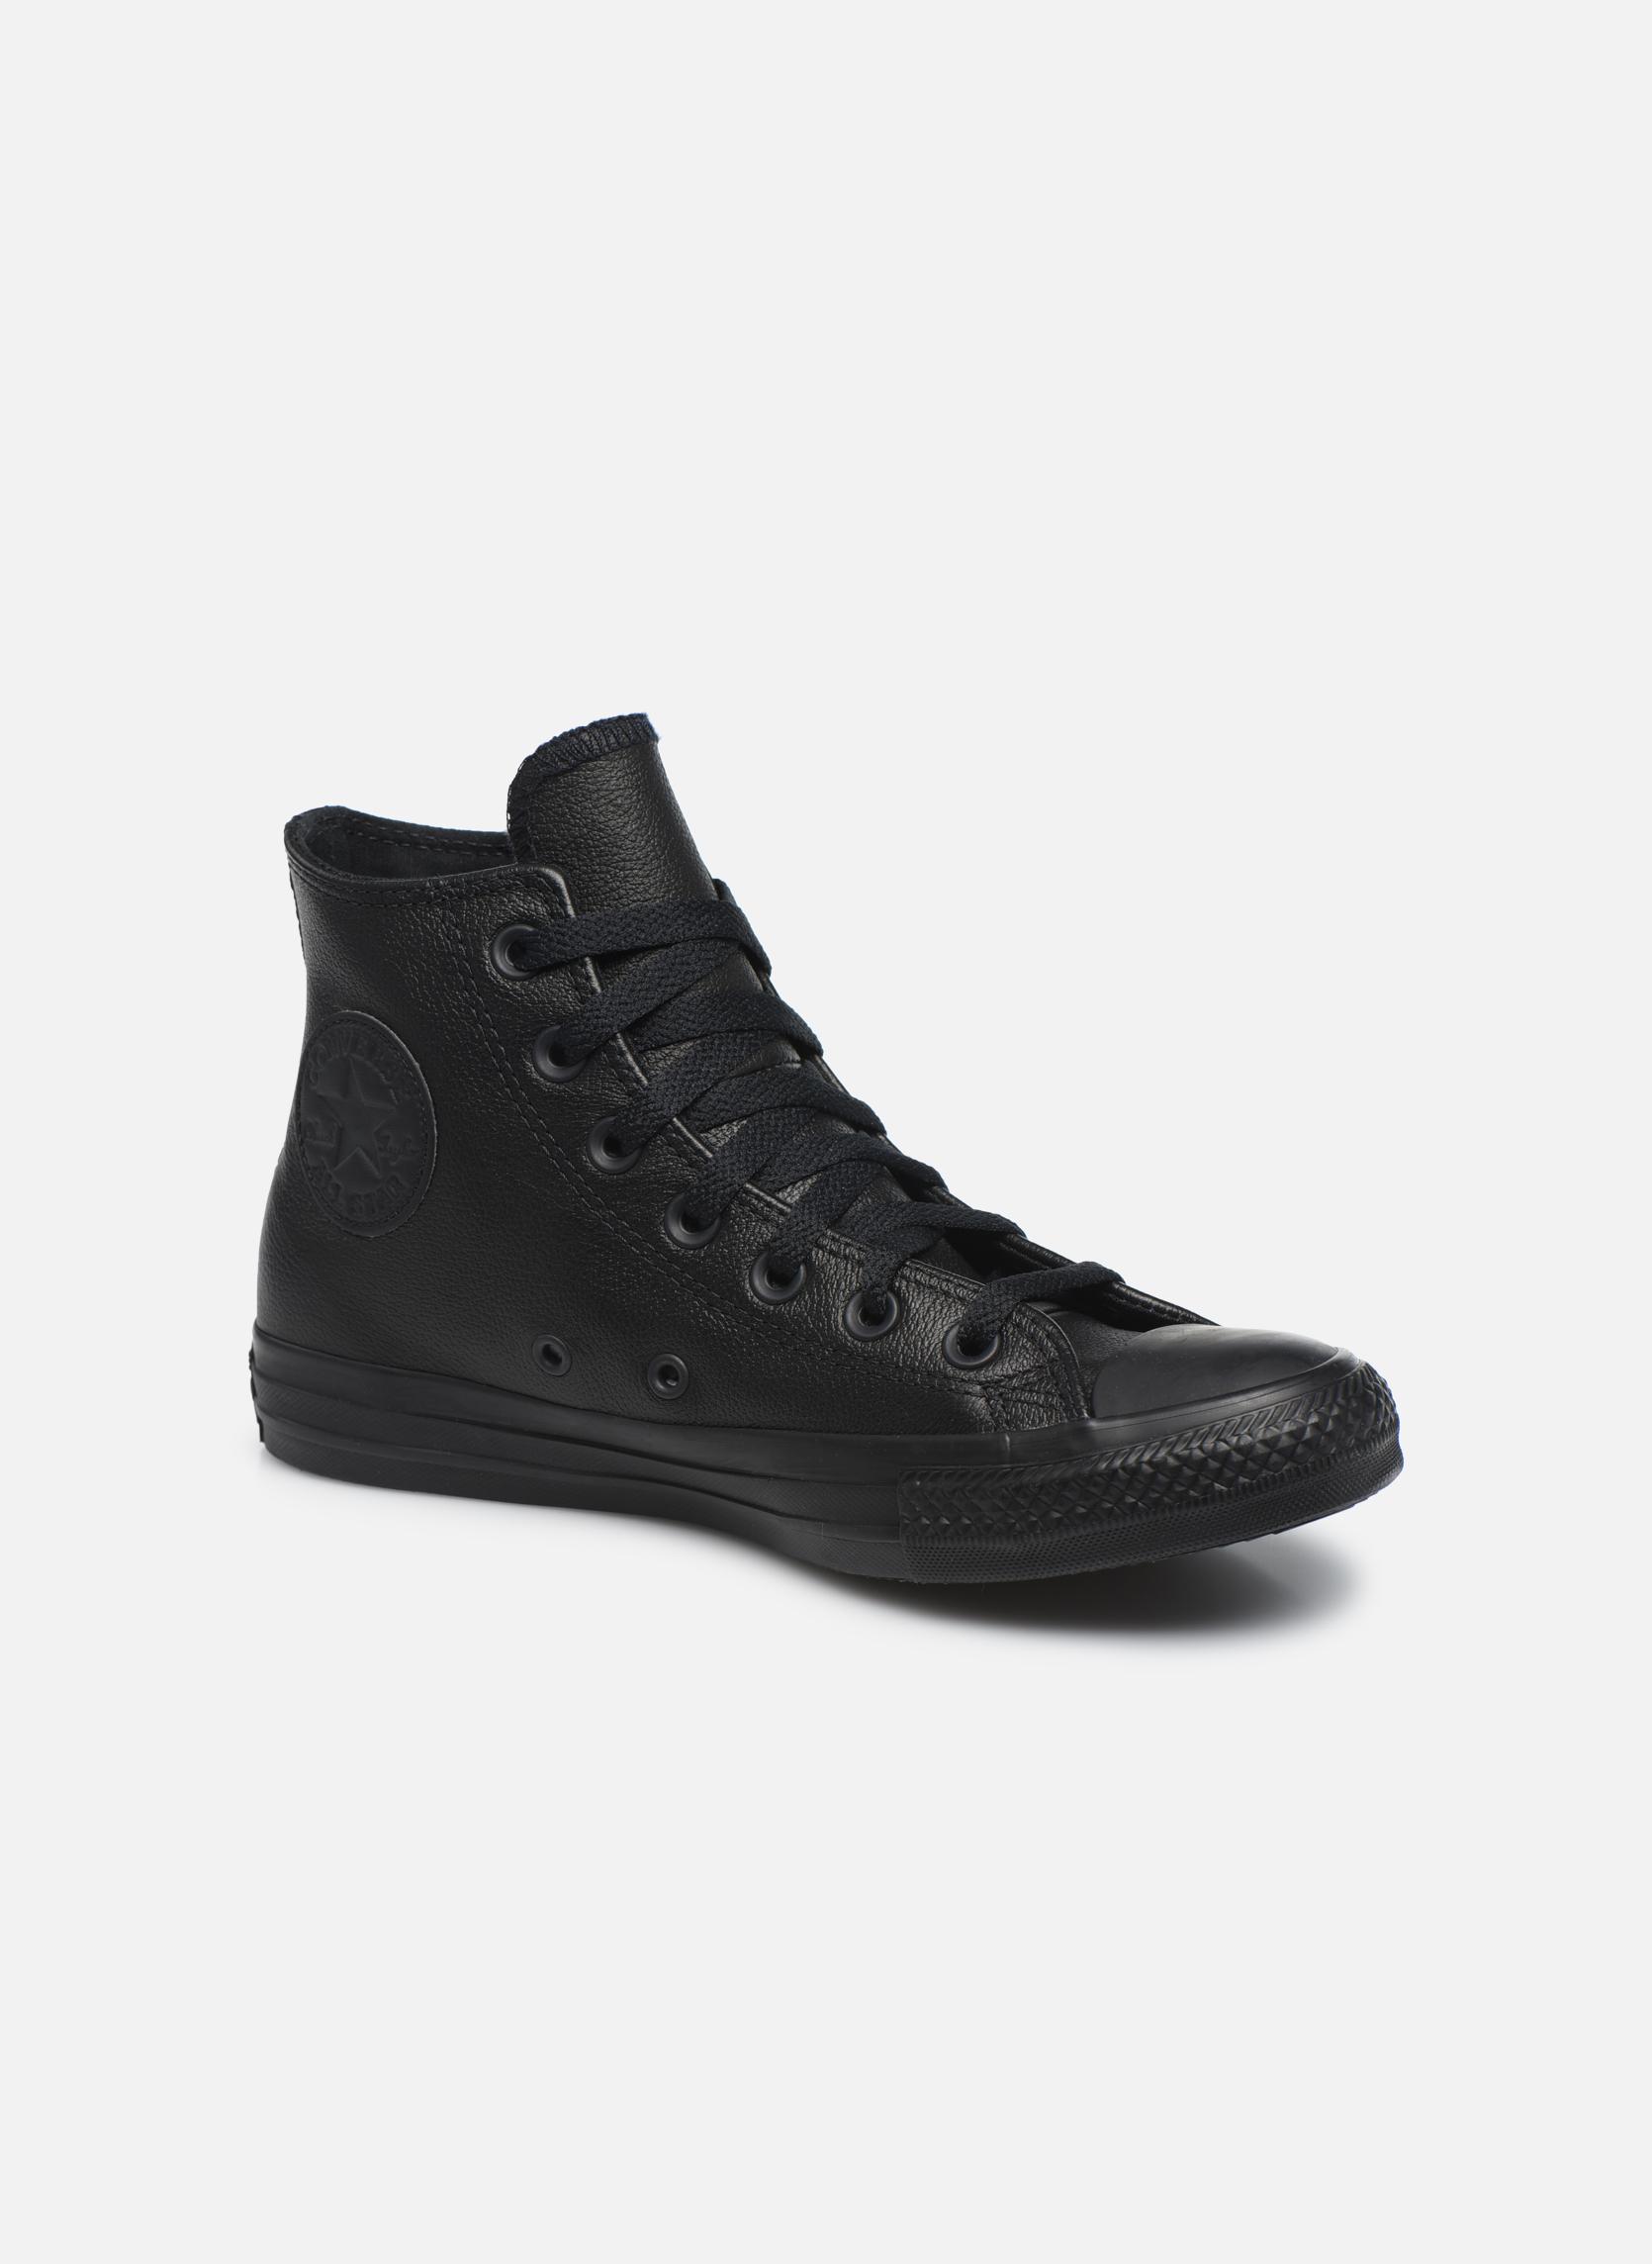 Baskets Femme Chuck Taylor All Star Mono Leather Hi W